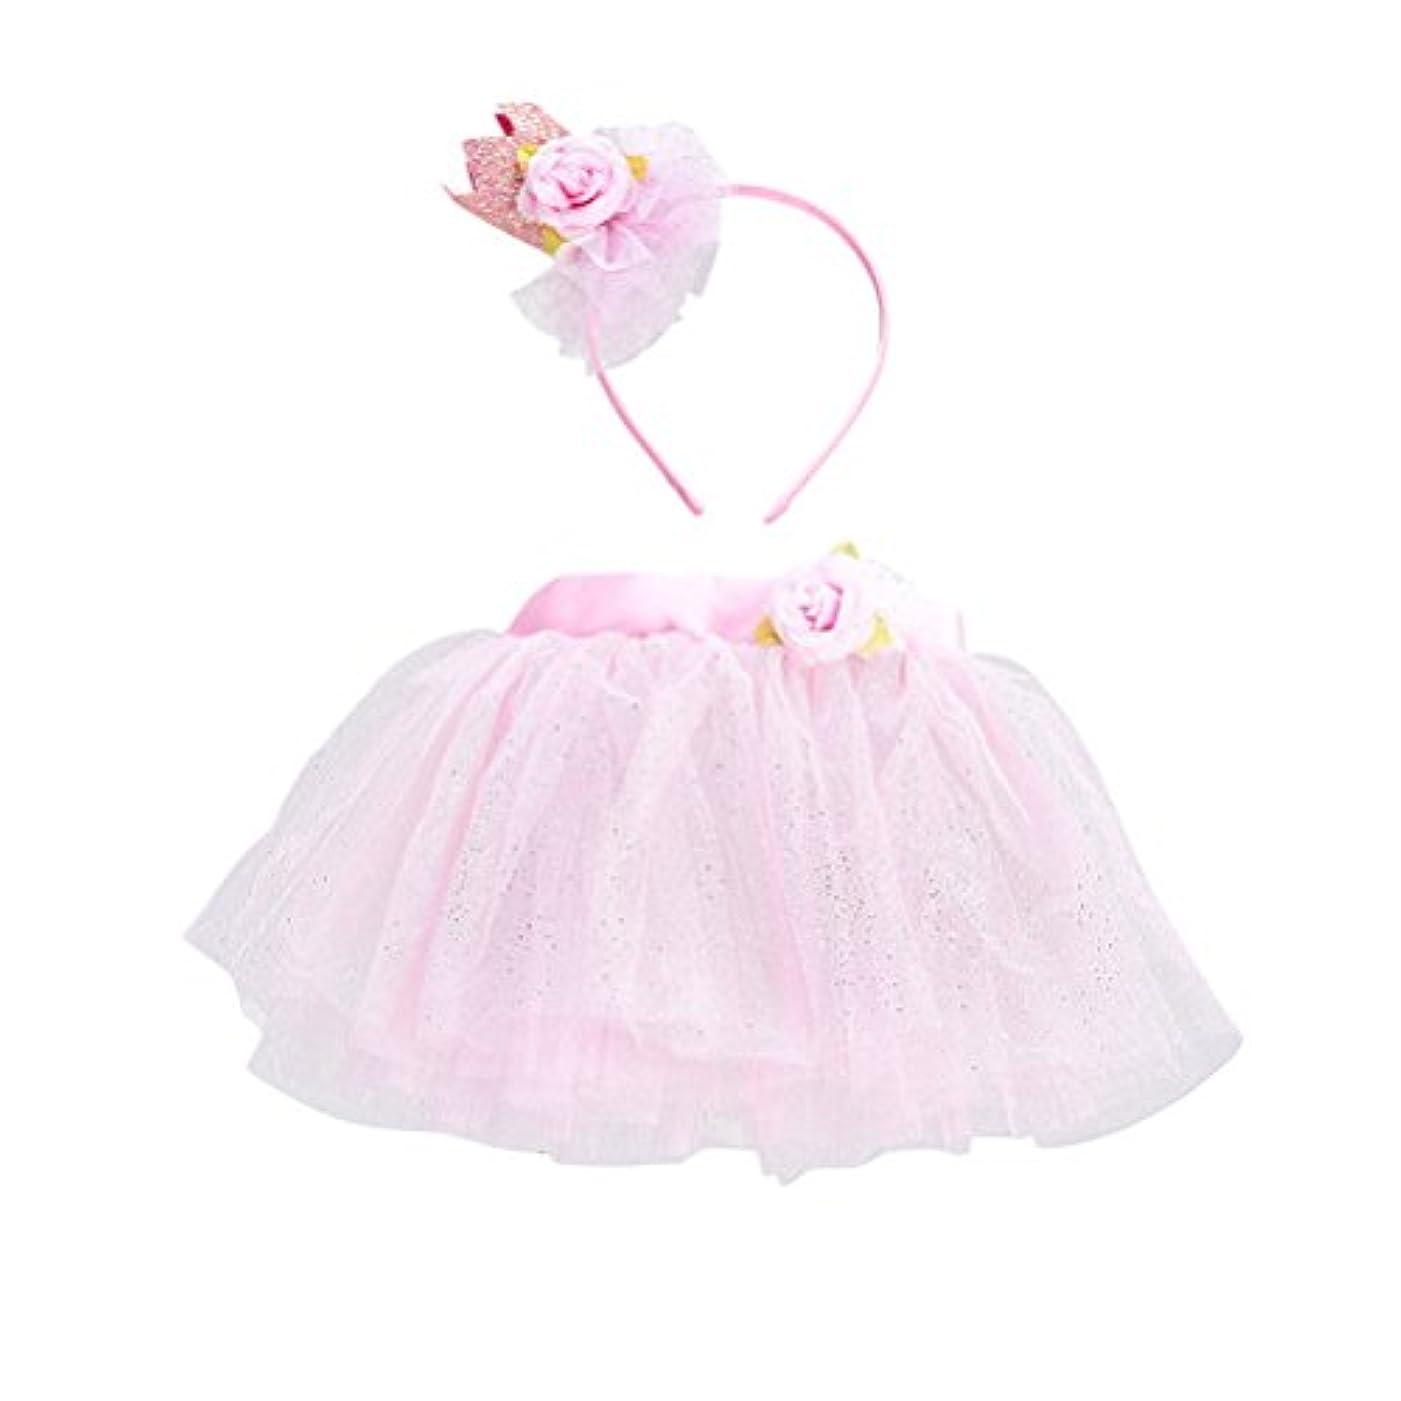 LUOEM 女の子TutuスカートセットヘッドバンドプリンセスガールTutu服装Baby Girls Birthday Outfit Set(ピンク)